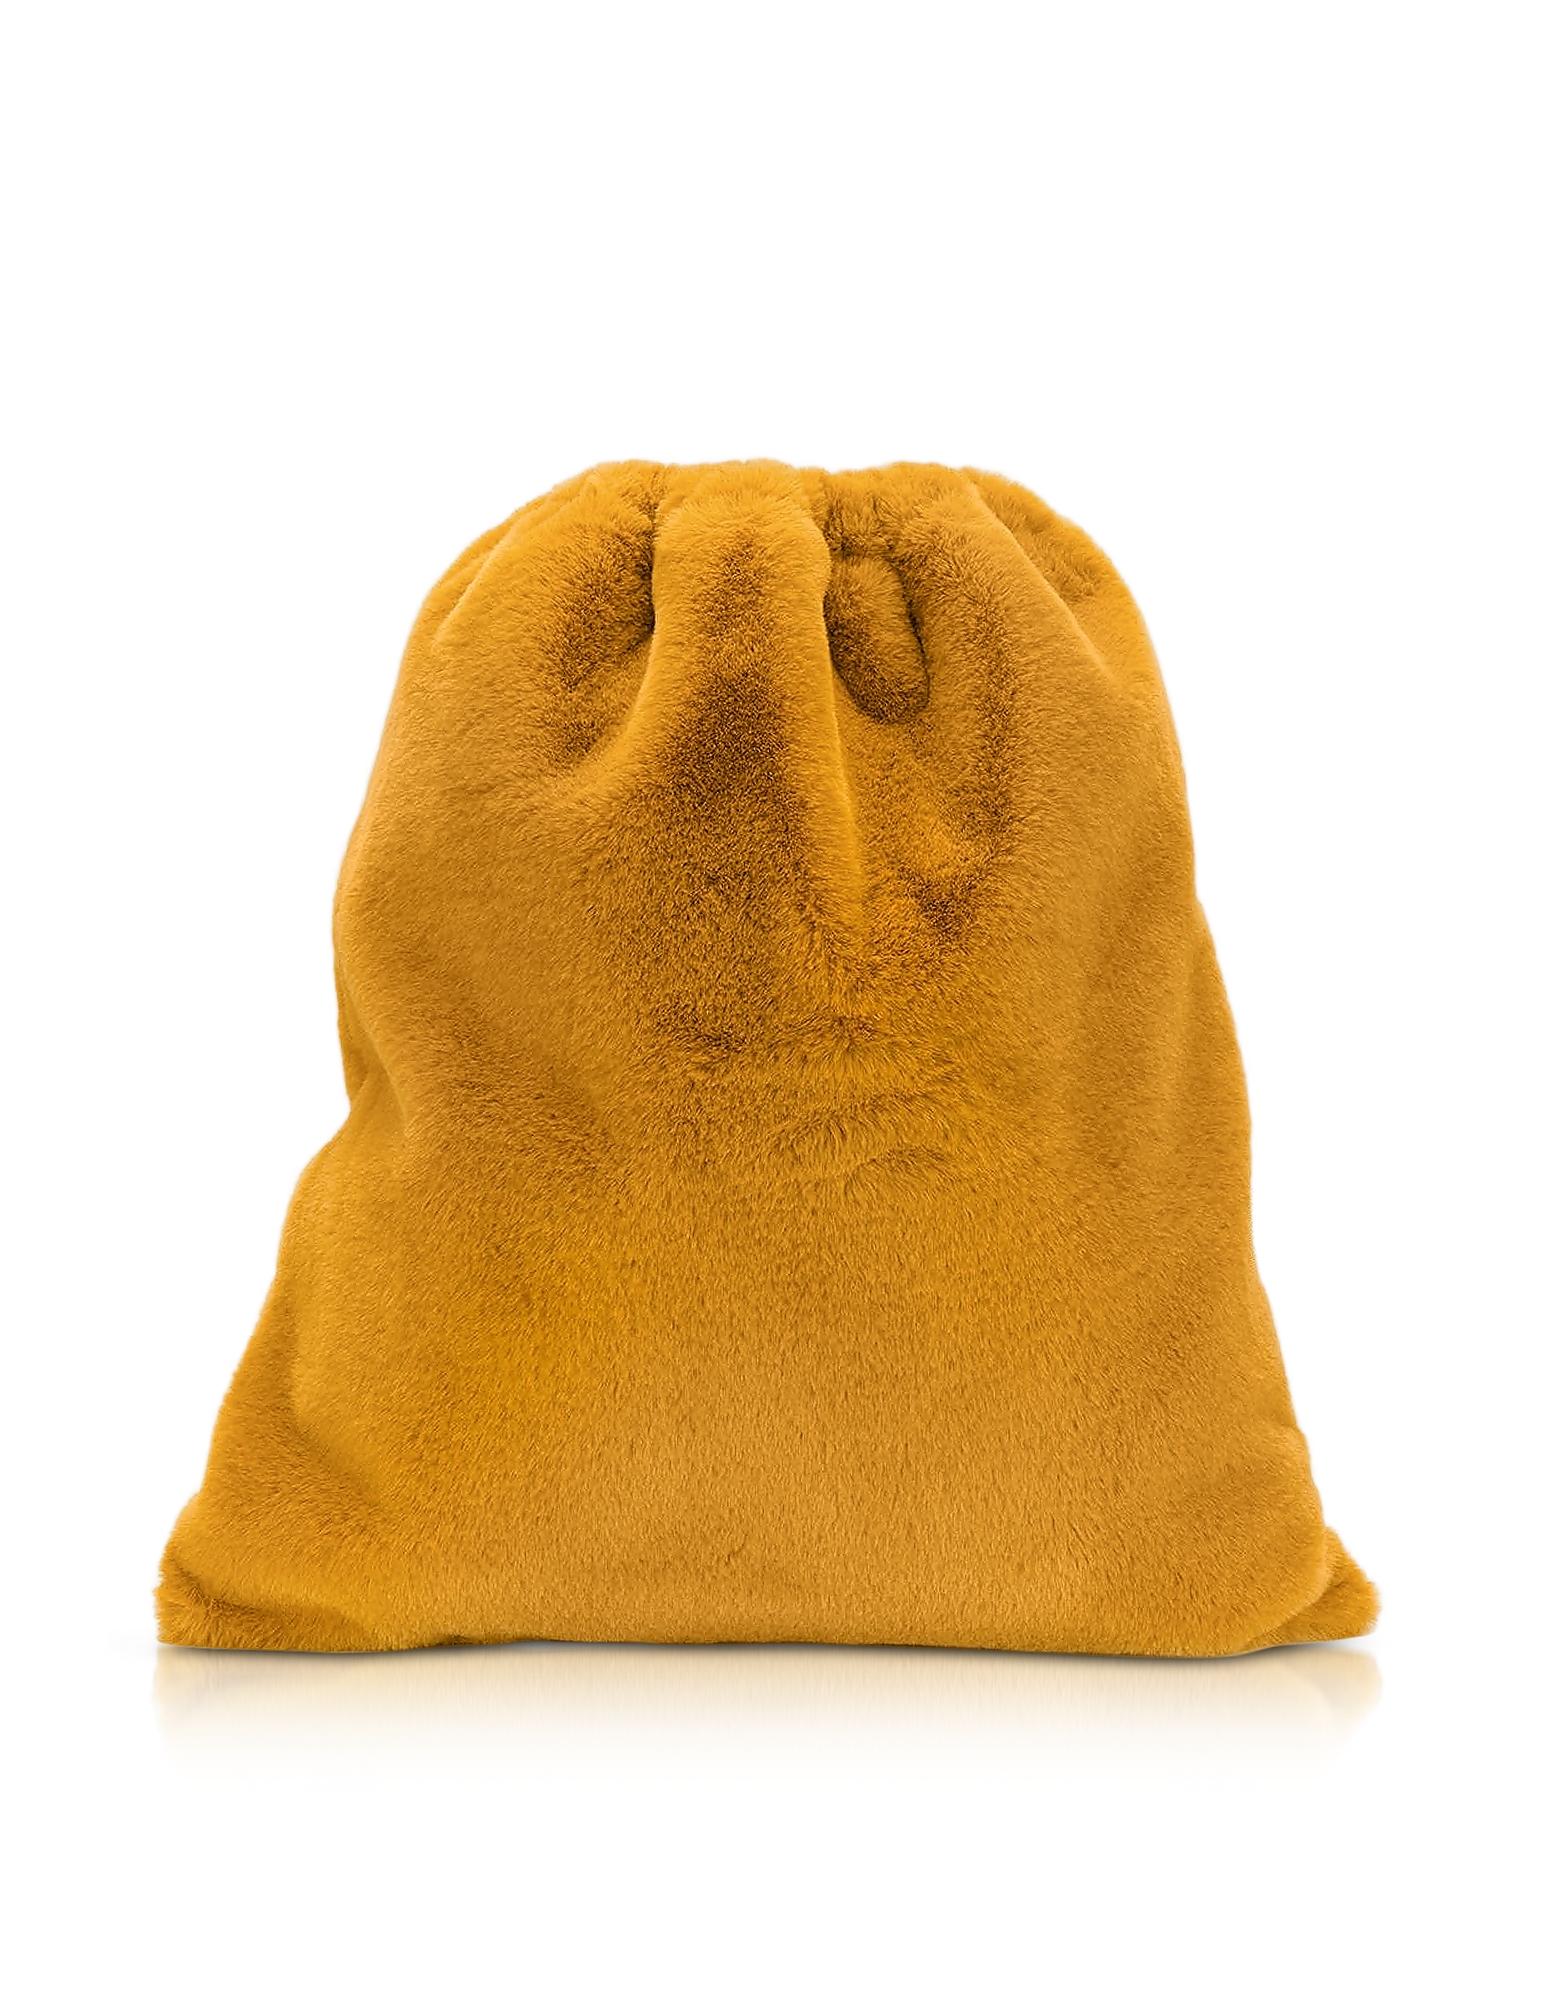 MM6 Maison Martin Margiela Designer Handbags, Fresia Yellow Furry Drawstring Backpack